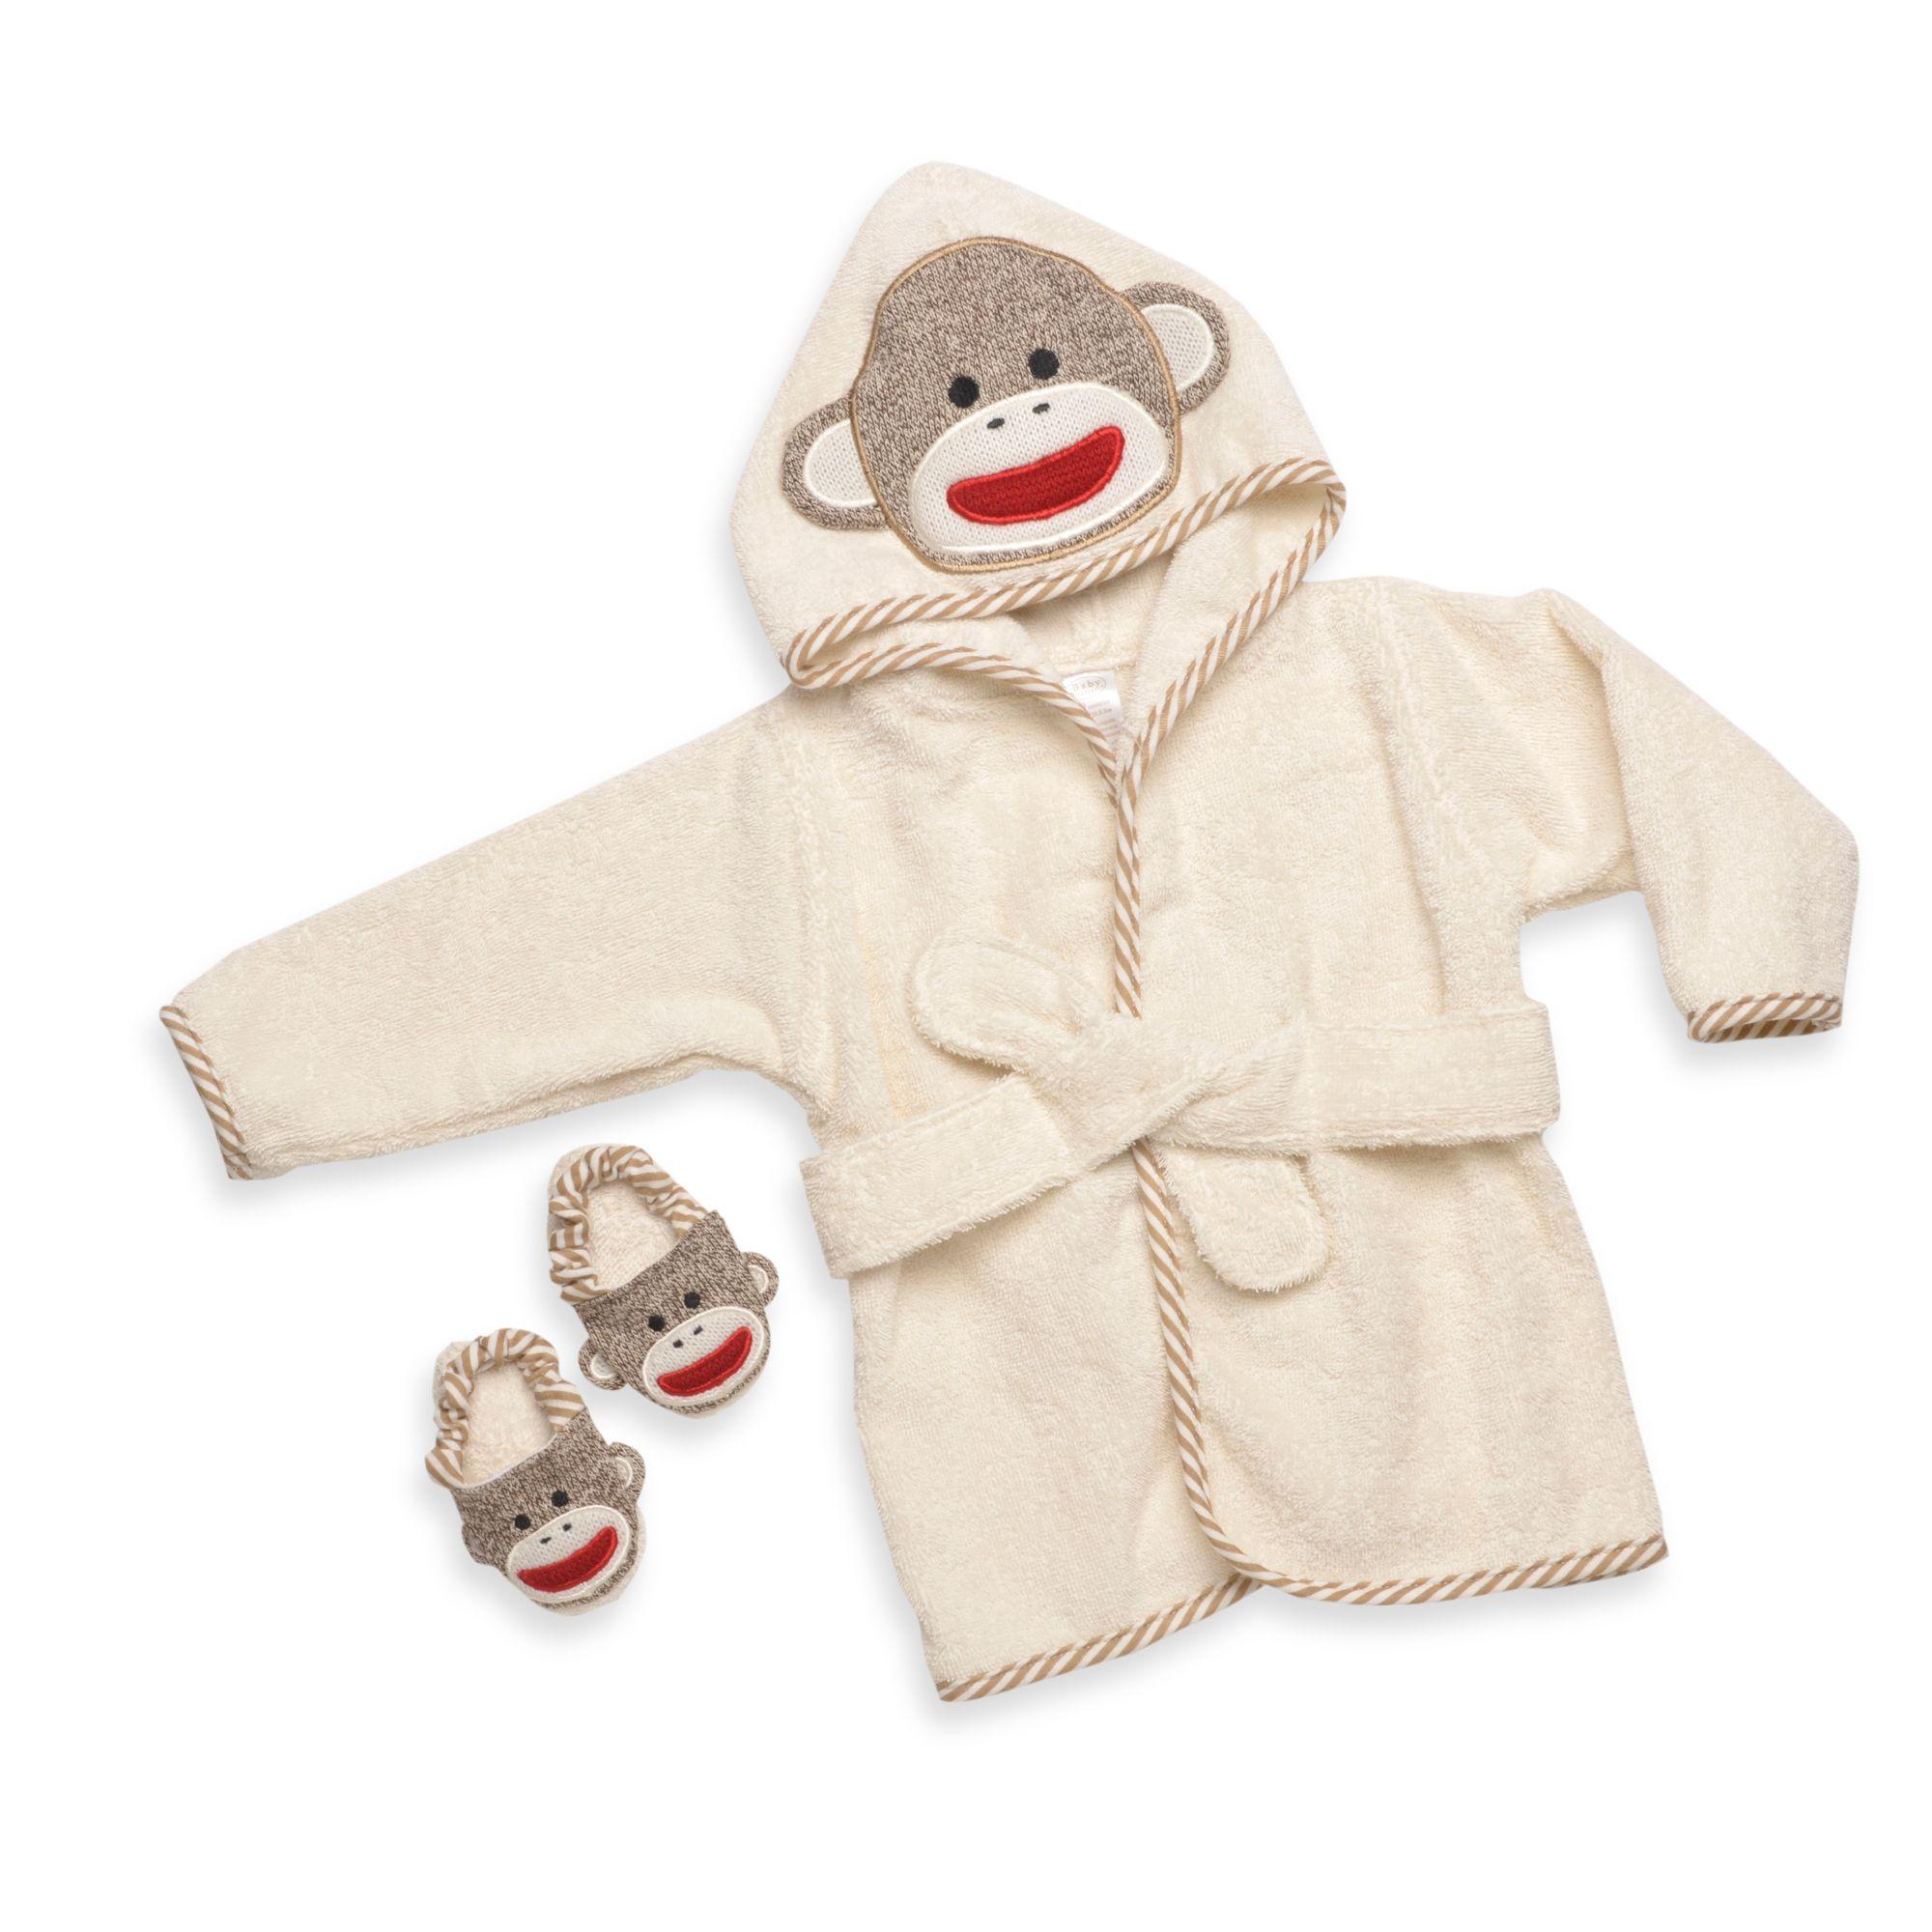 Baby Starters® Sock Monkey Bathrobe & Slippers Set in Cream